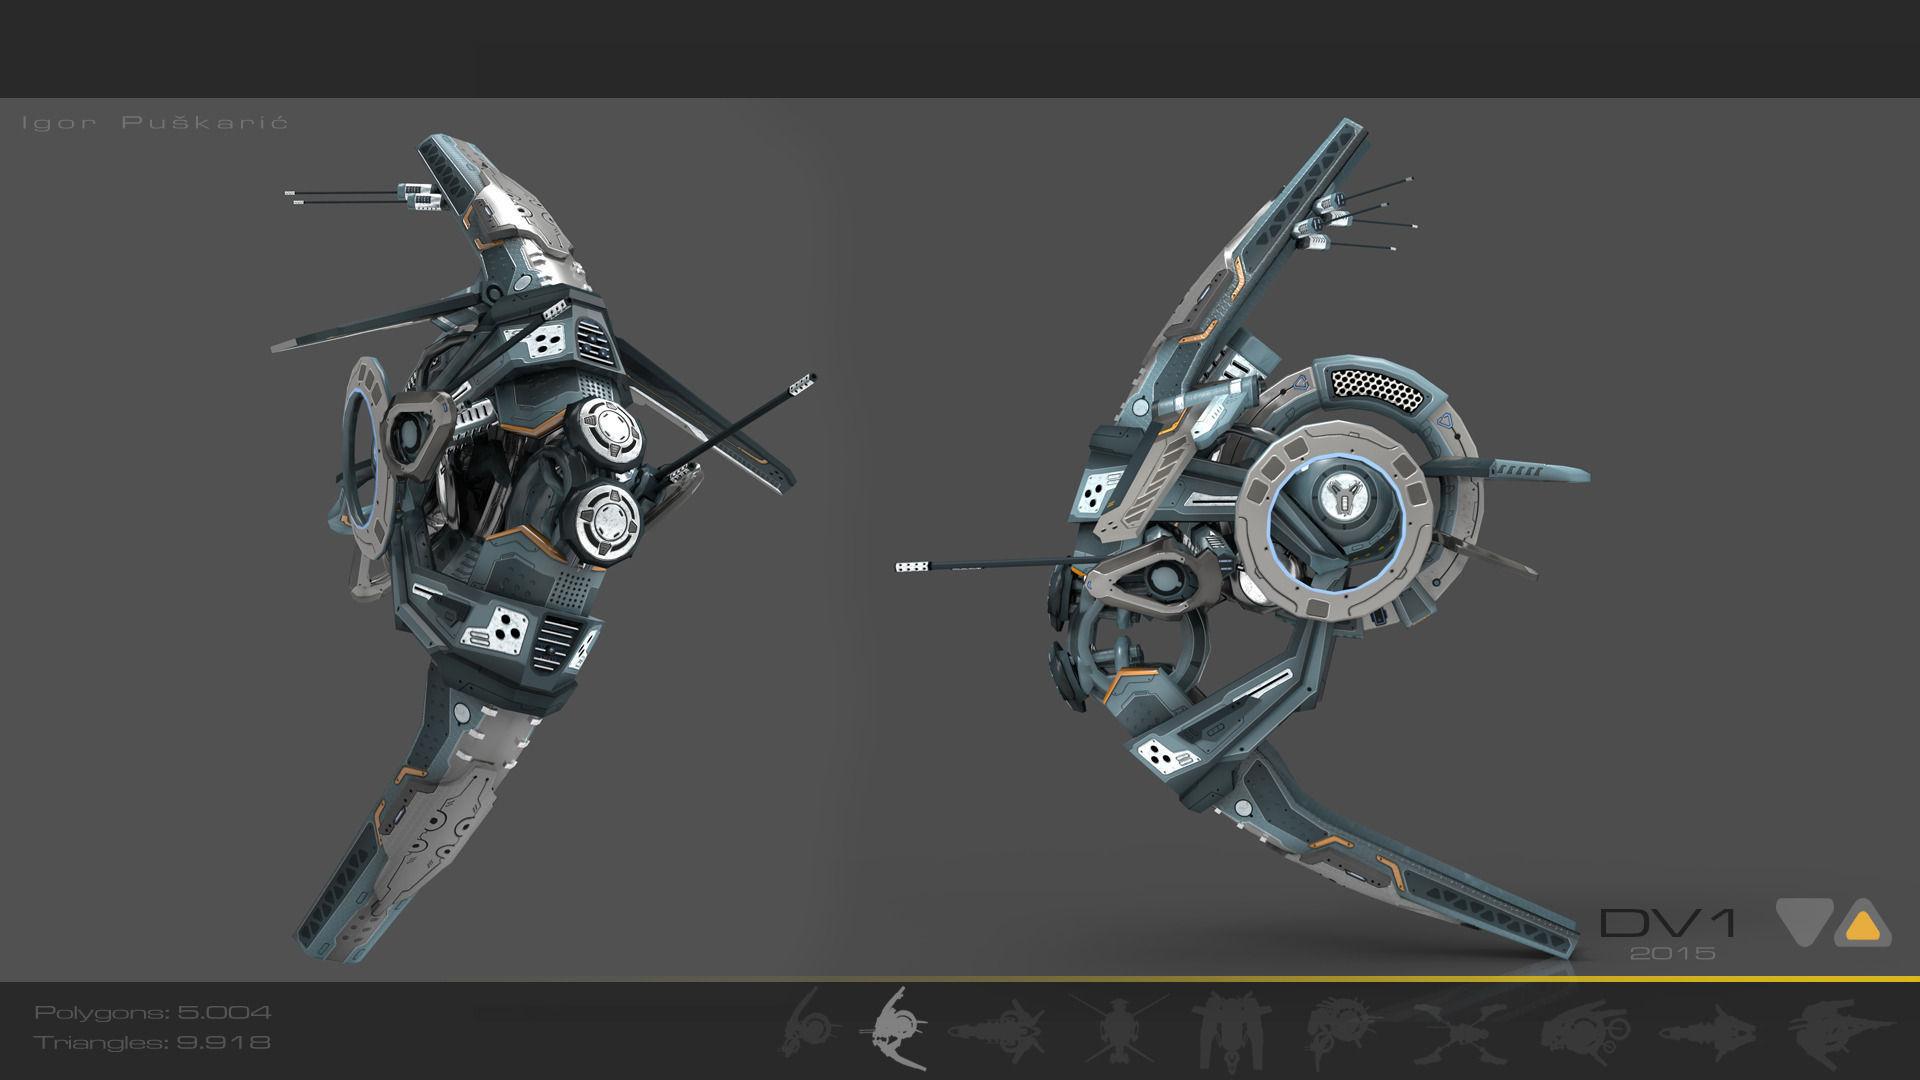 Cybertech Drone V1